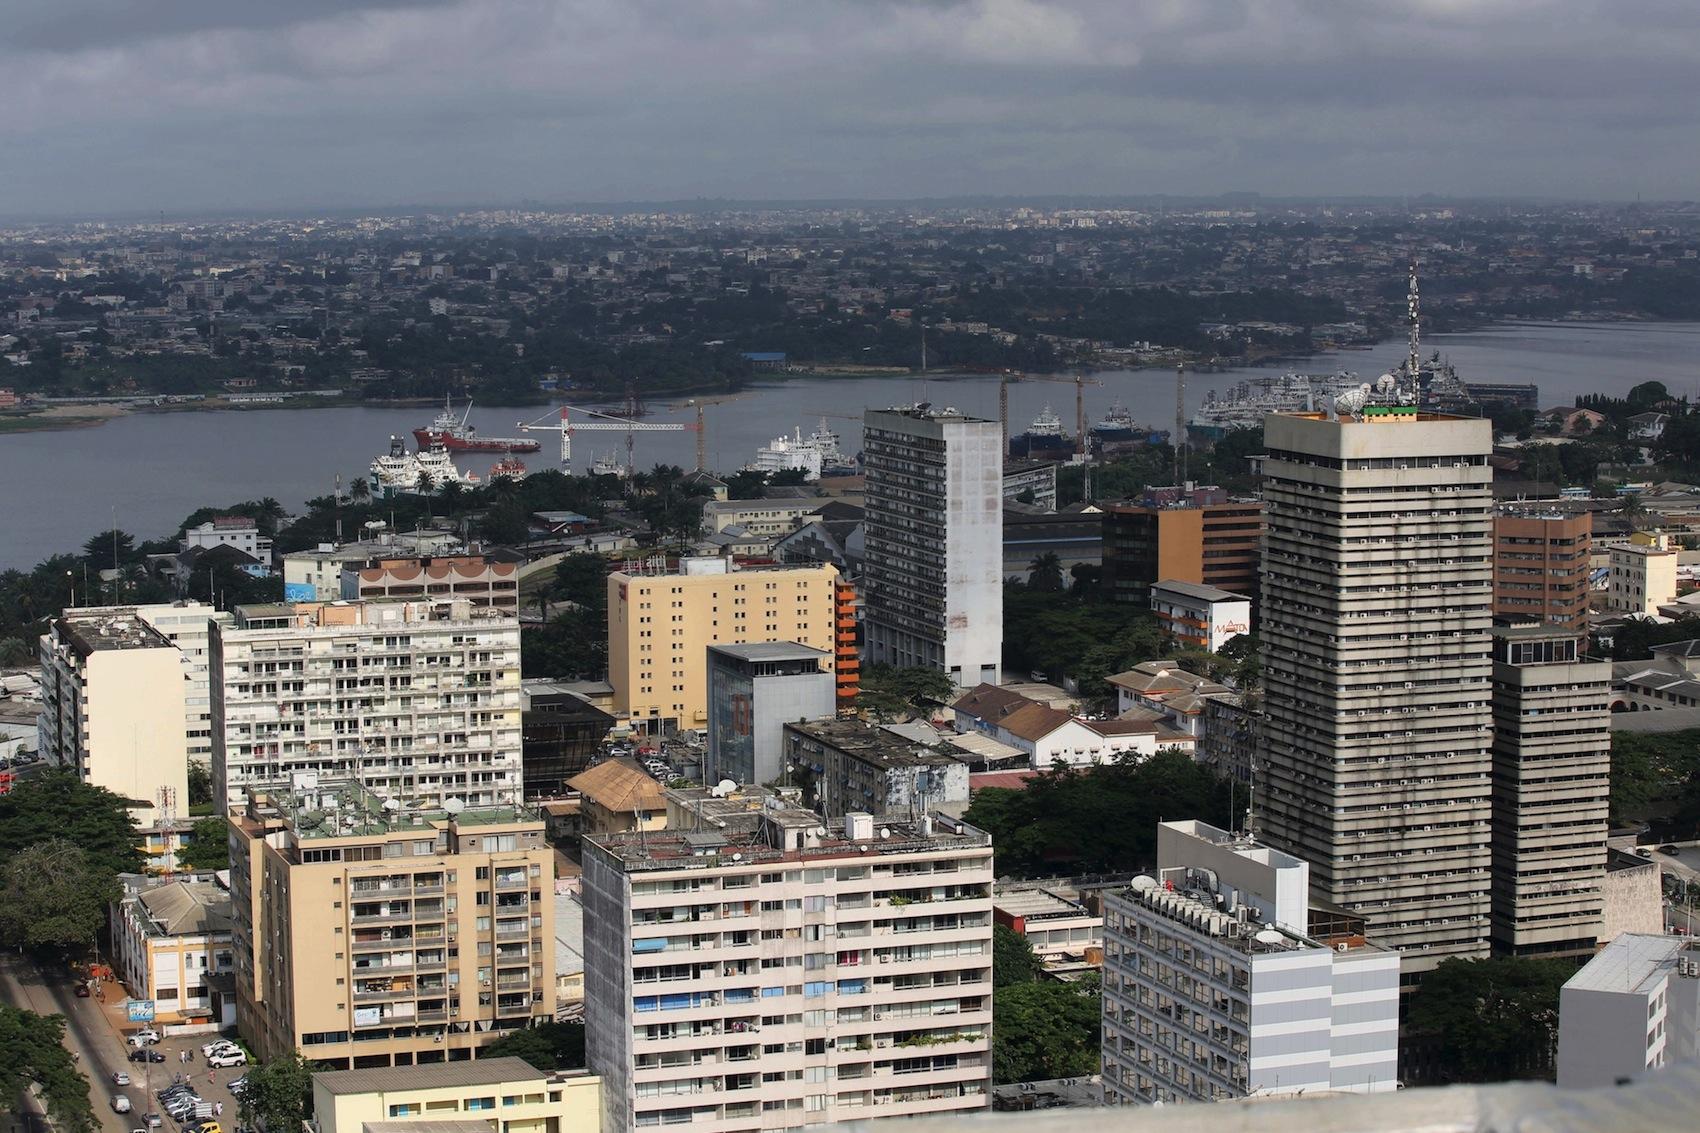 The Plateau district, Abidjan's business center.